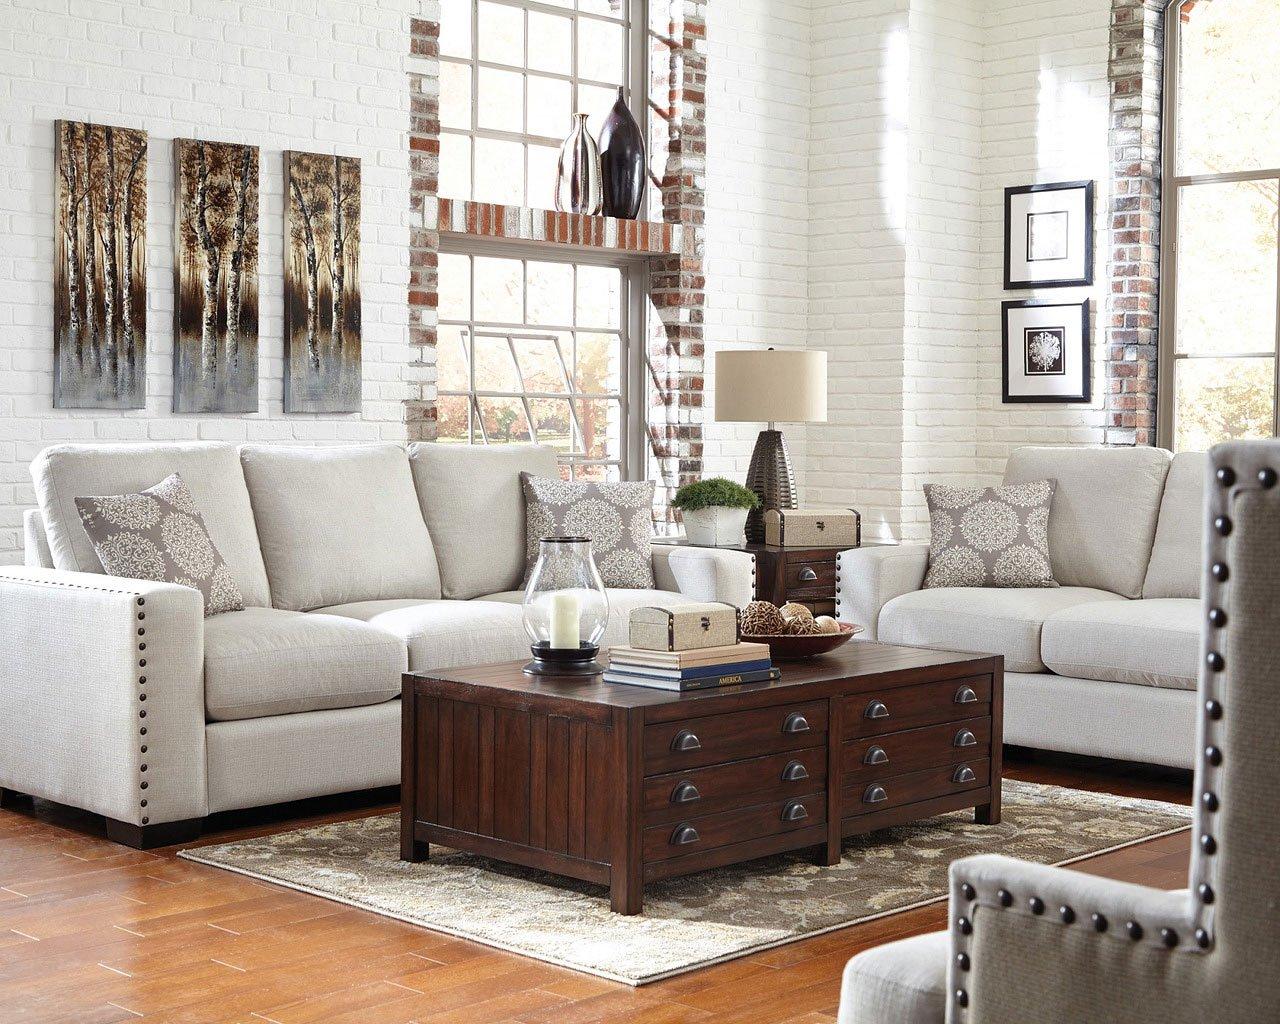 Swell Rosanna Living Room Set Cream Download Free Architecture Designs Scobabritishbridgeorg